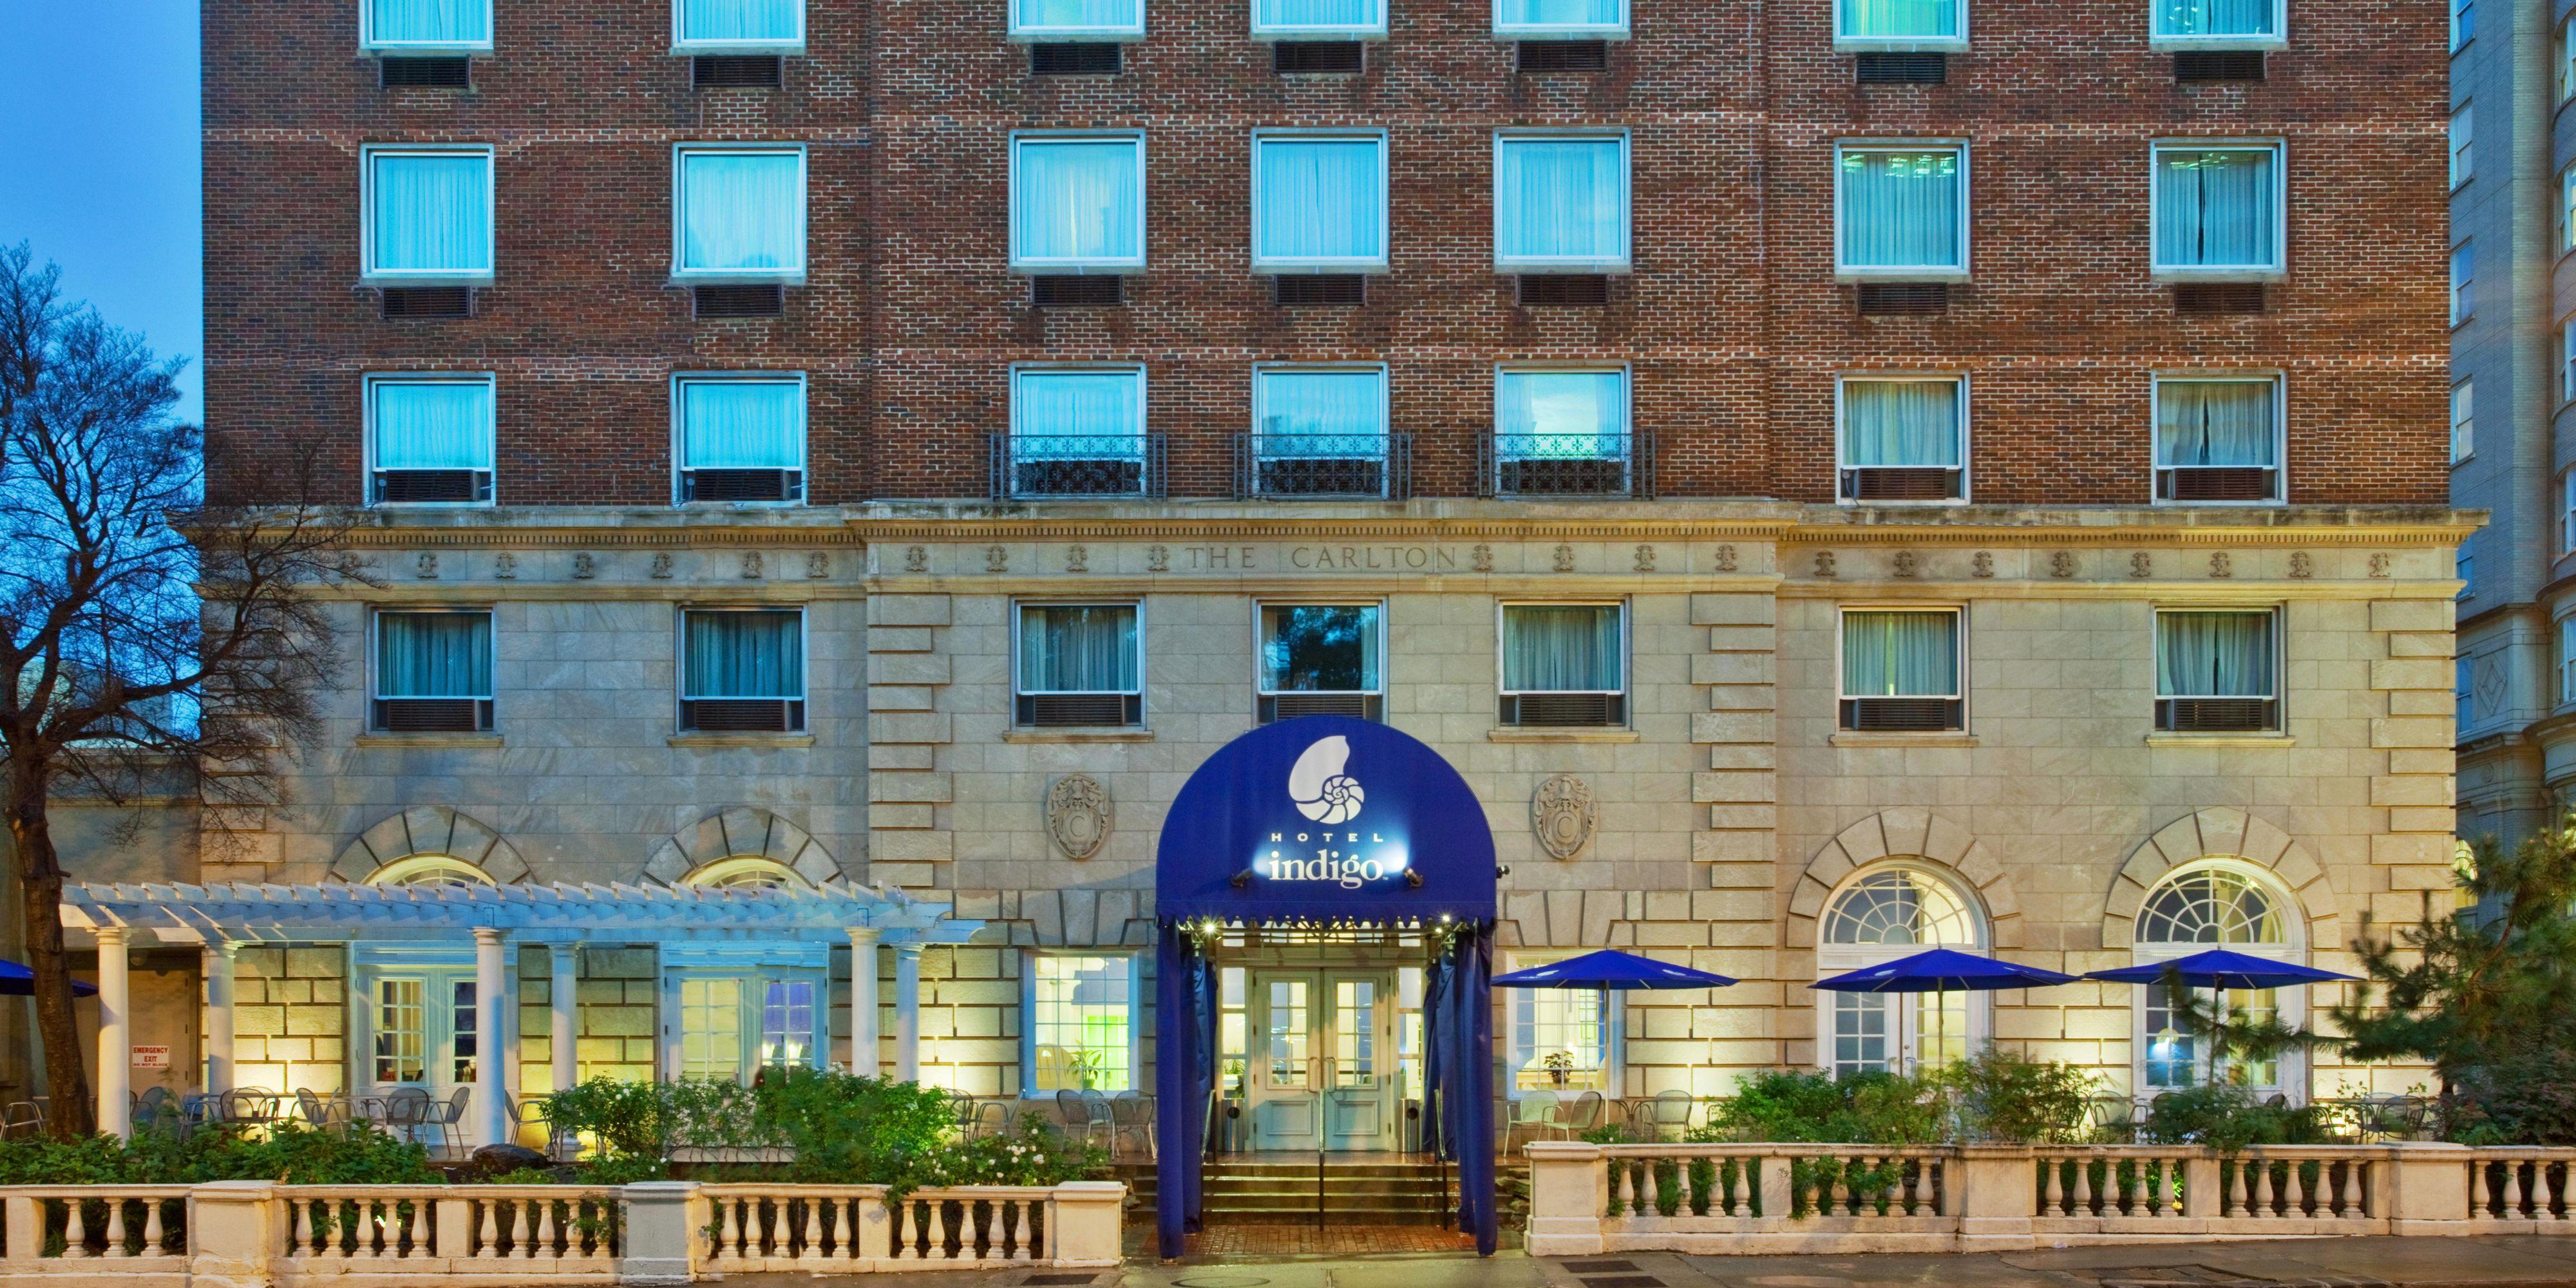 ... Hotel Indigo Front Entrance ...